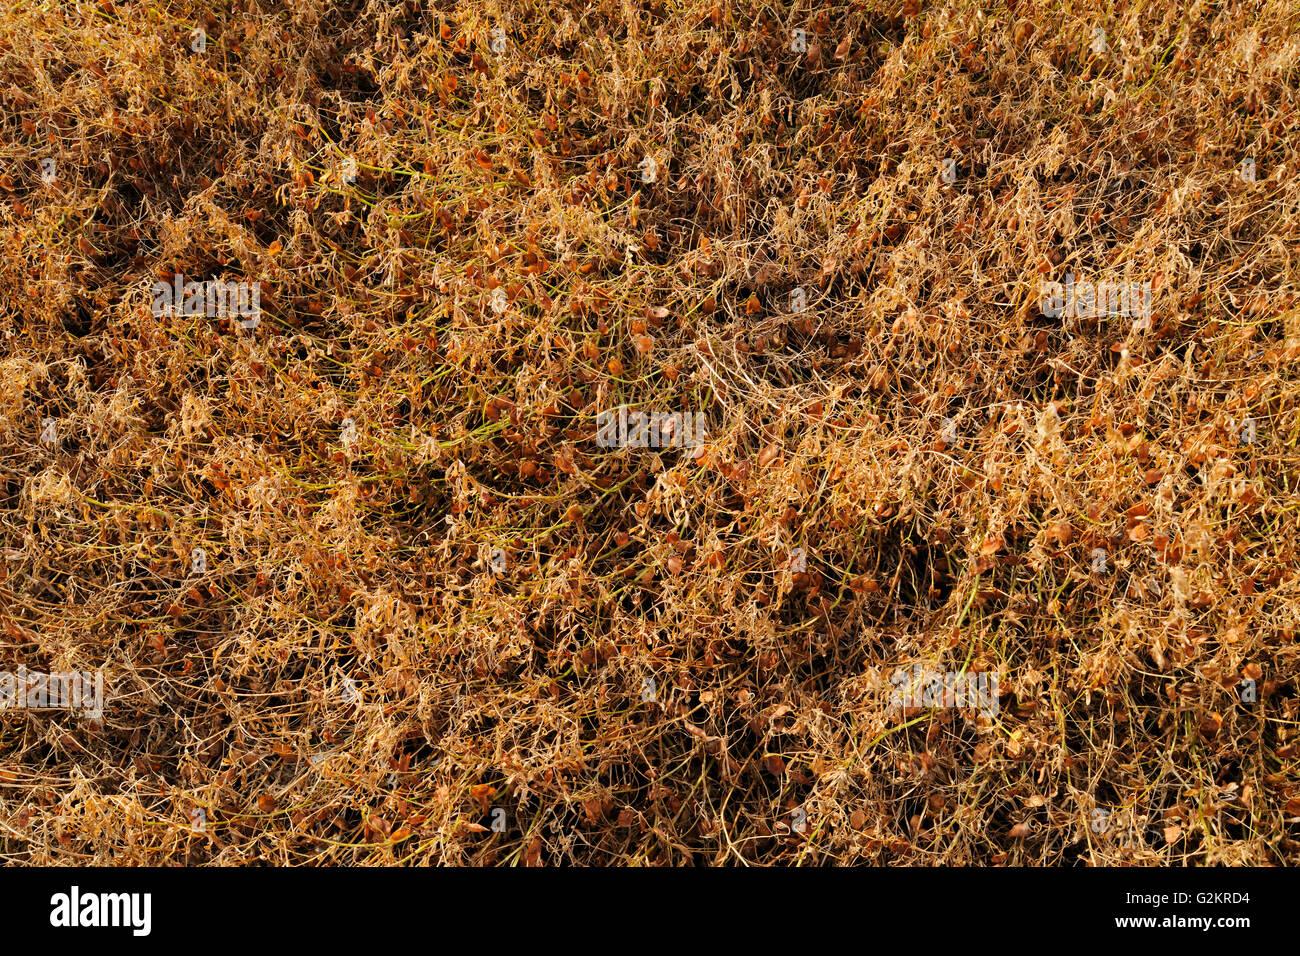 Lentils Morse Saskatchewan Canada - Stock Image